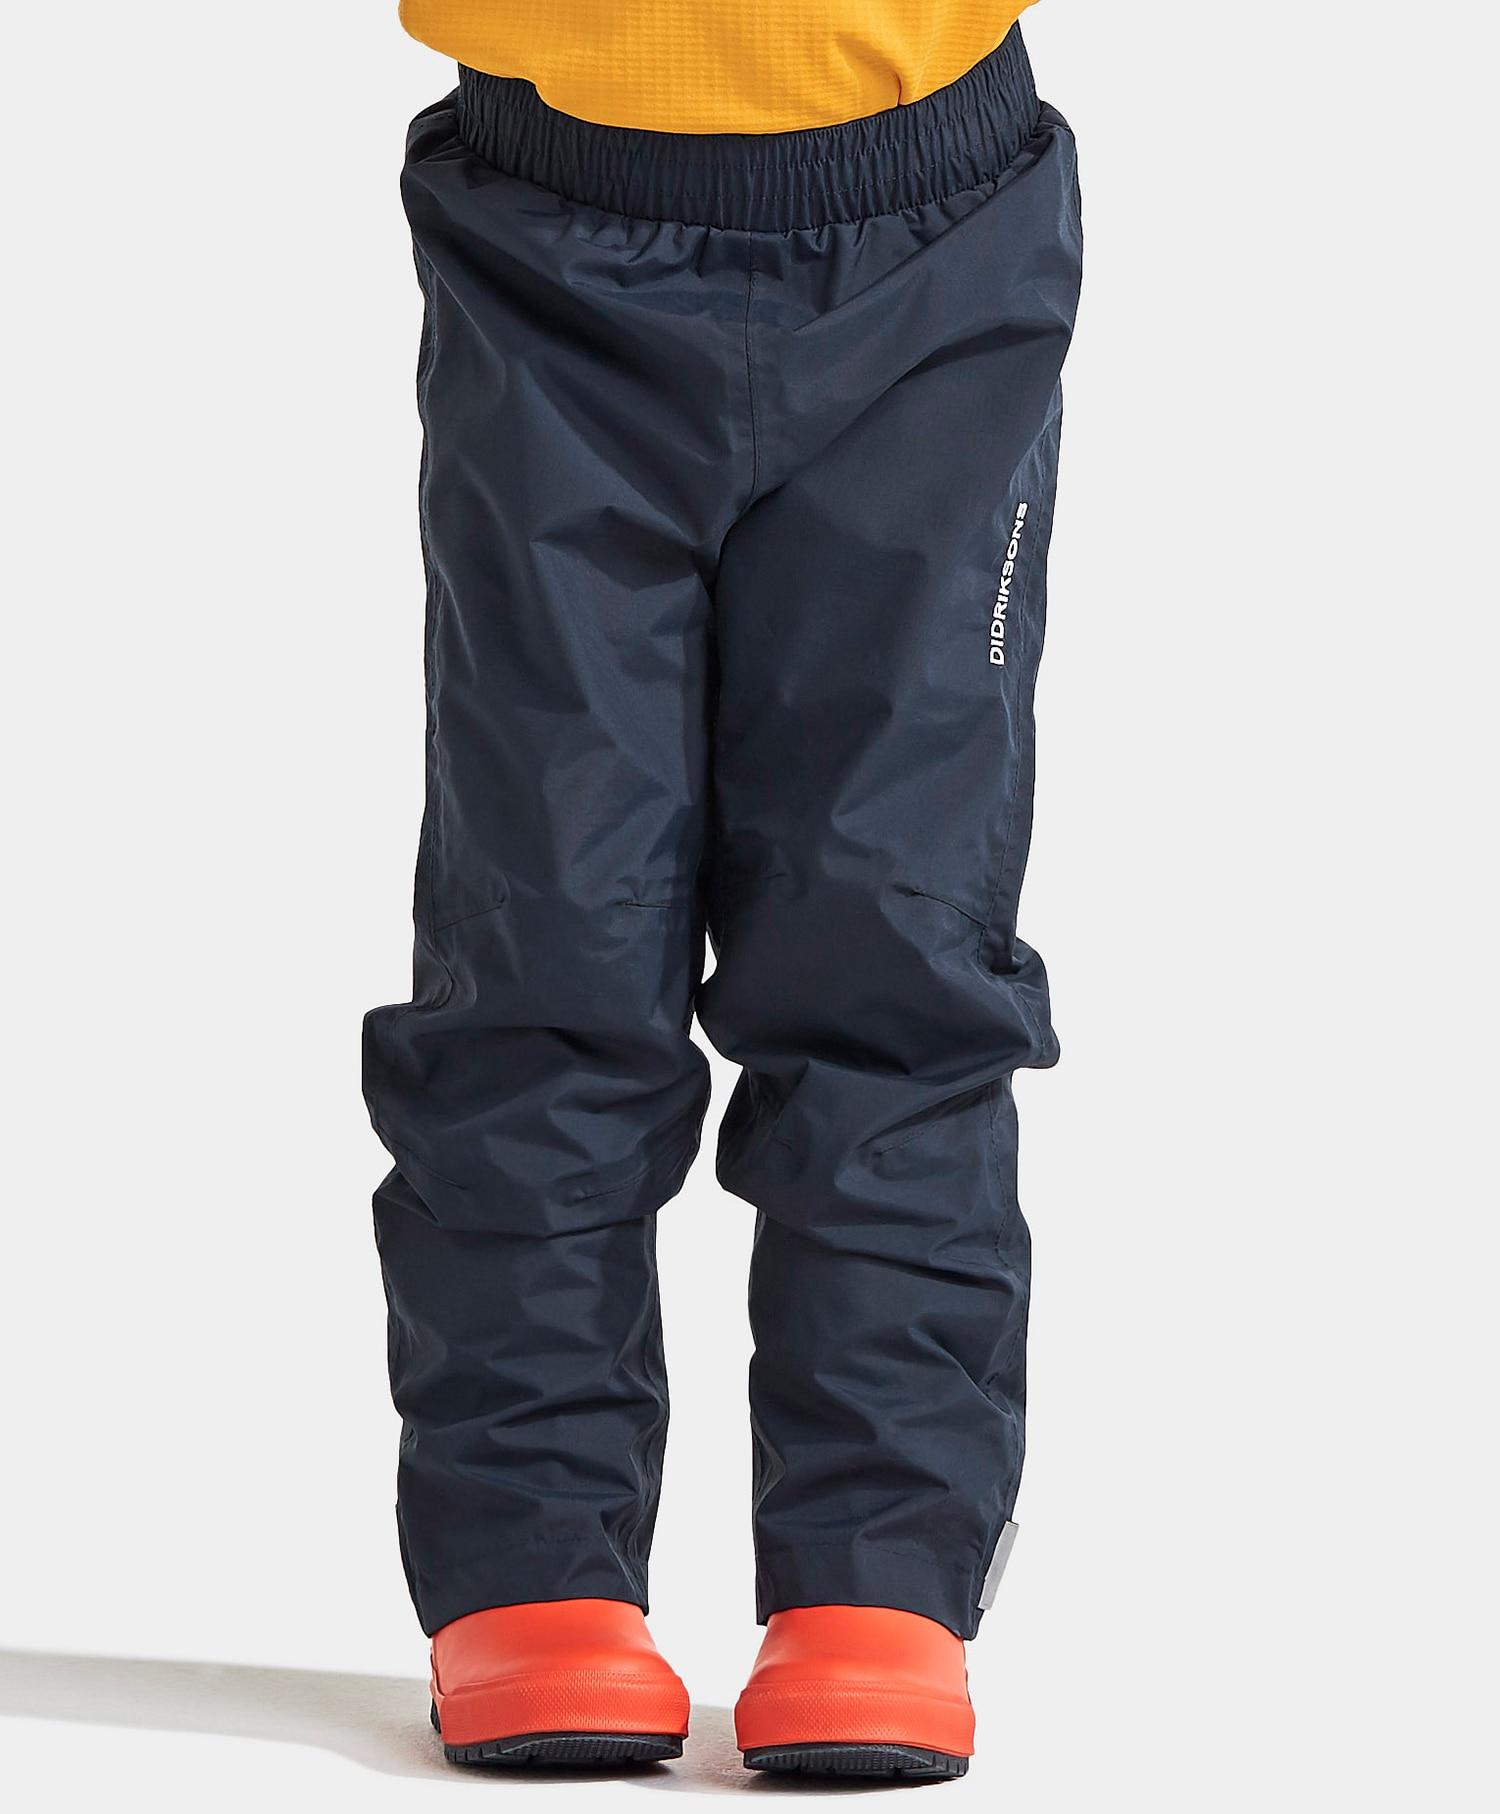 Didriksons Nobi bukse